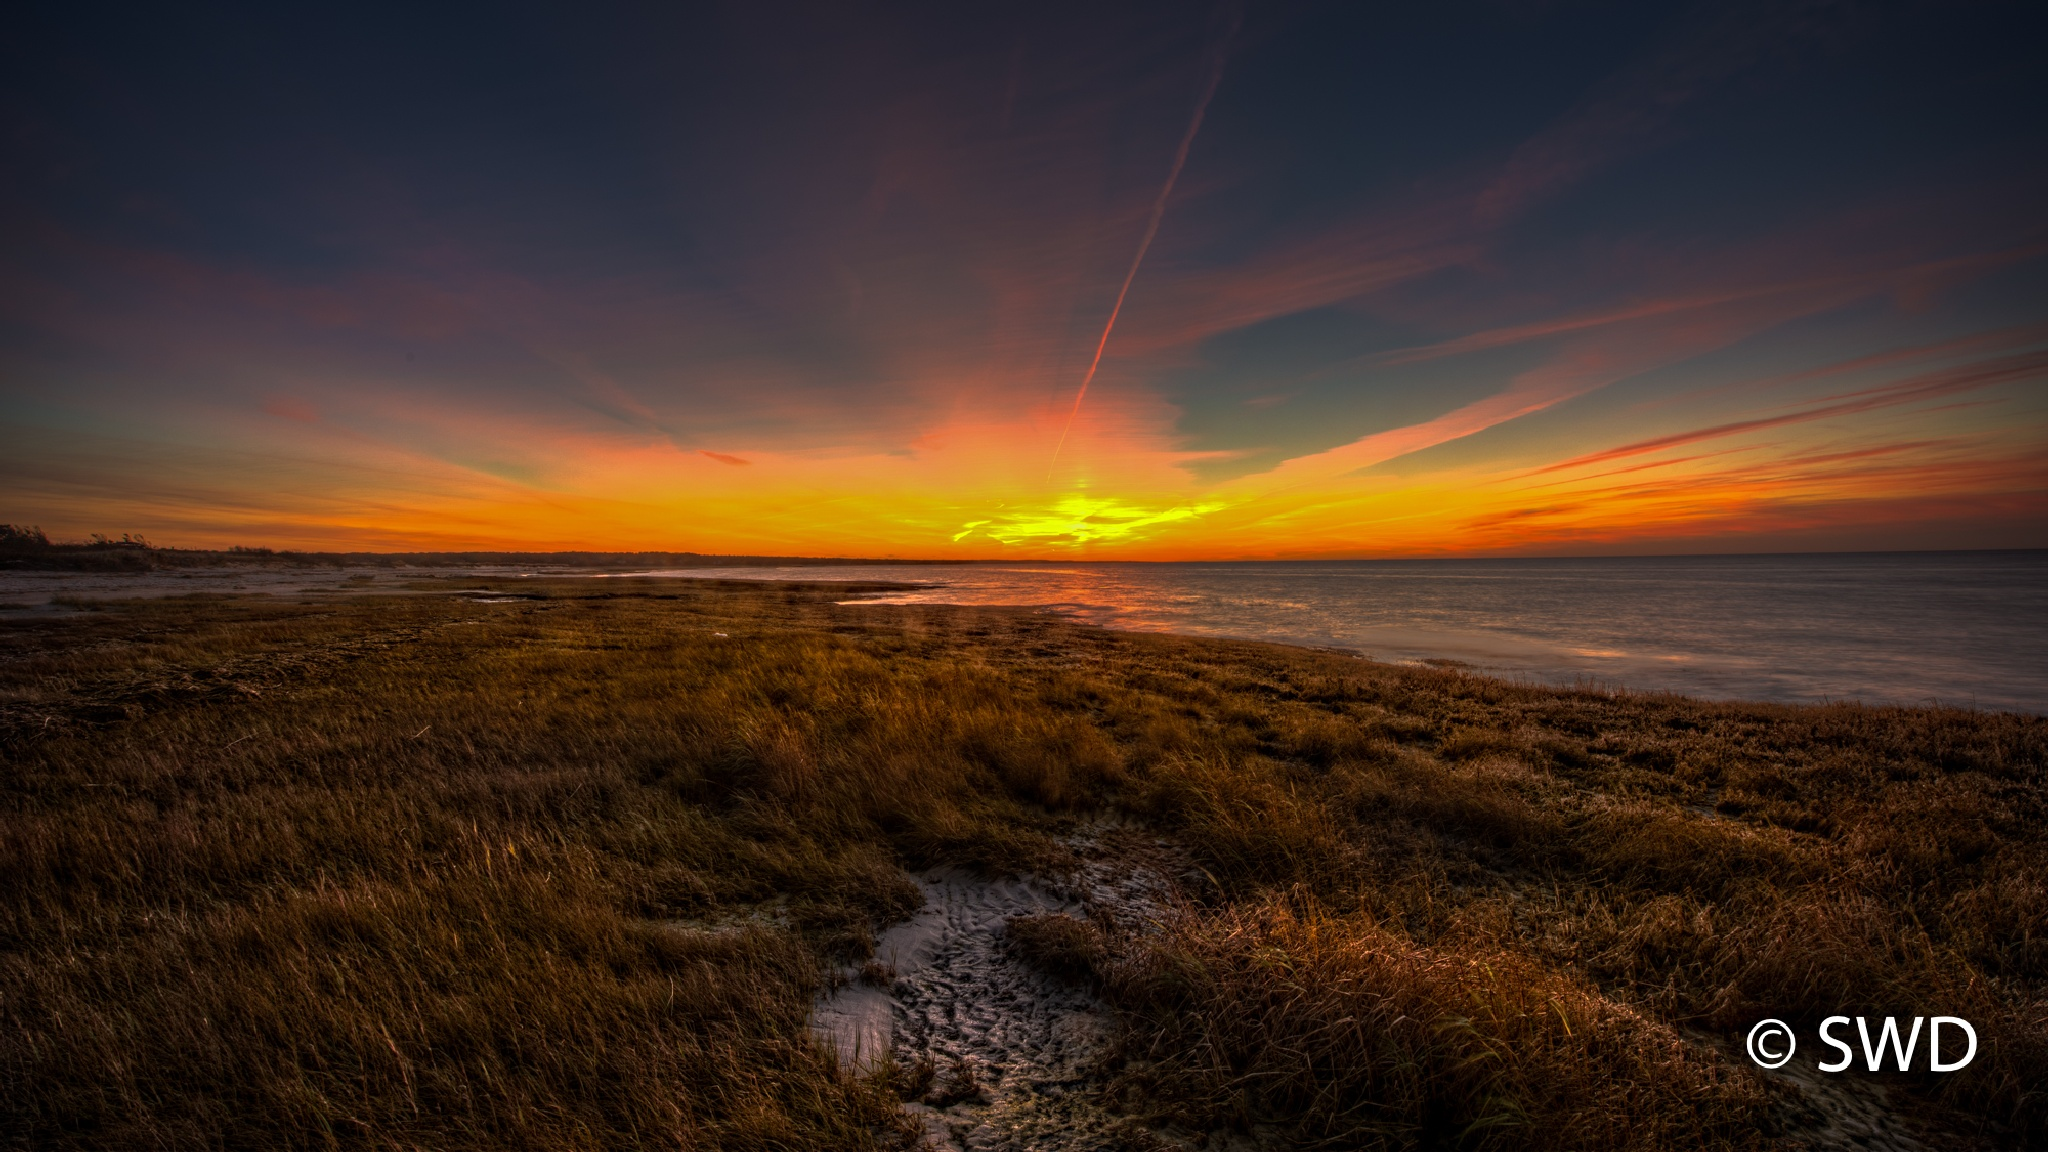 Sunset at Skaket Beach, Cape Cod by Steve Director